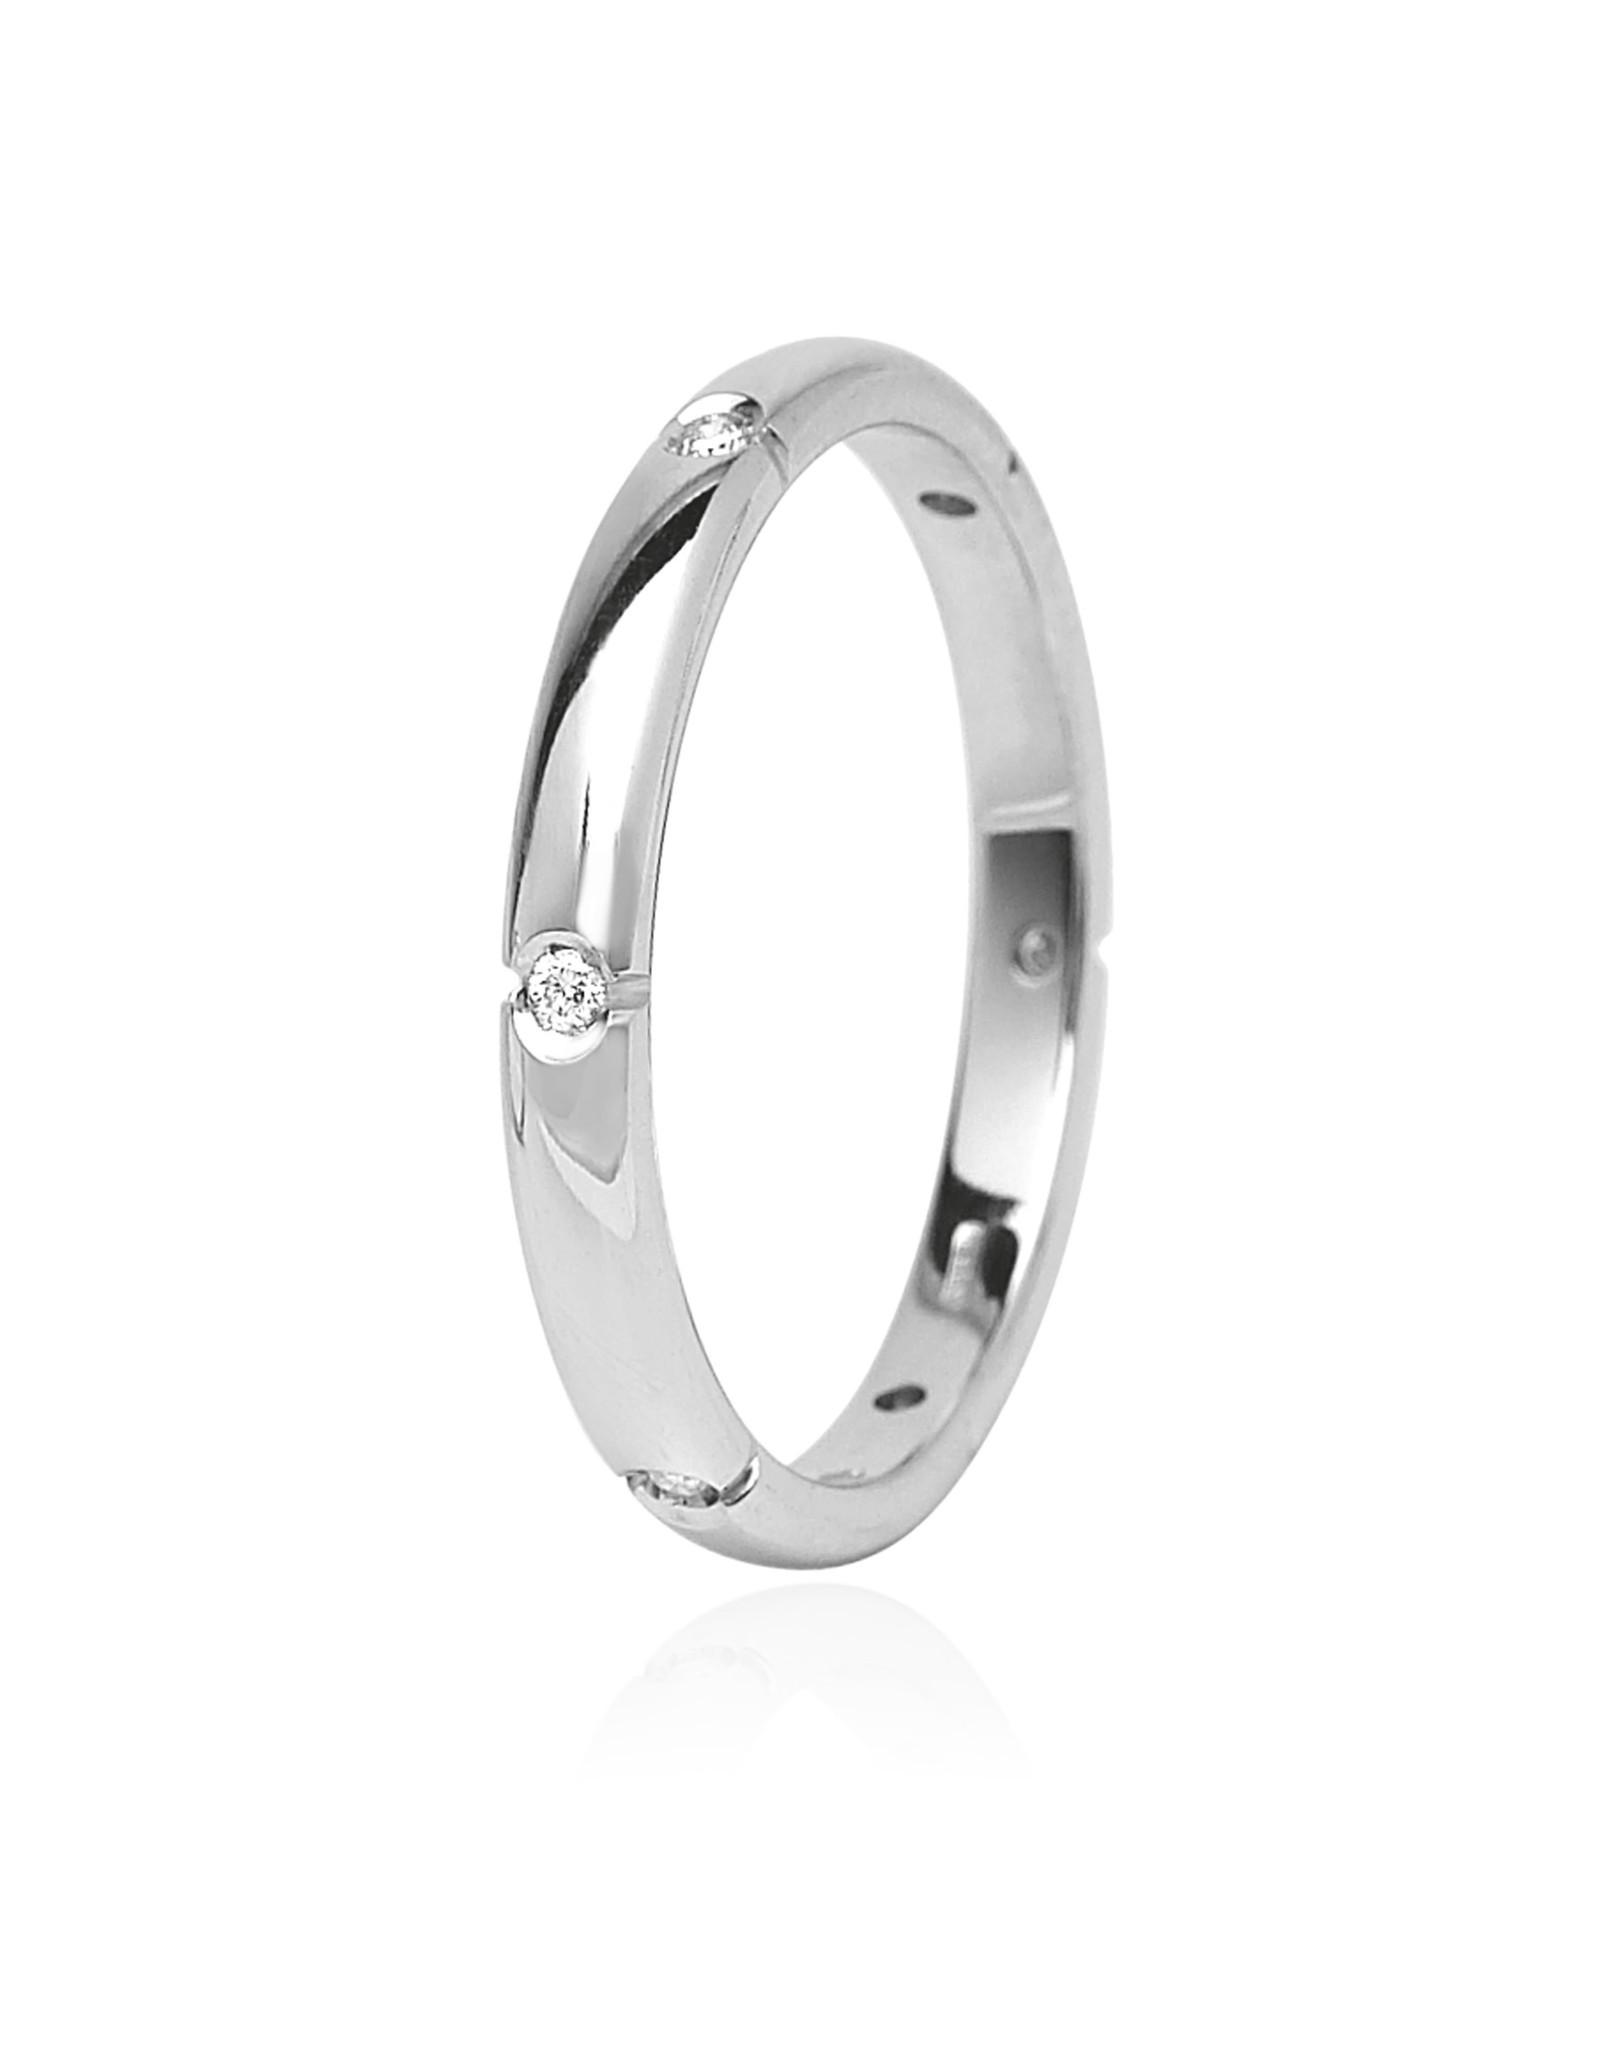 LVN Trouwring Witgoud Met Diamant